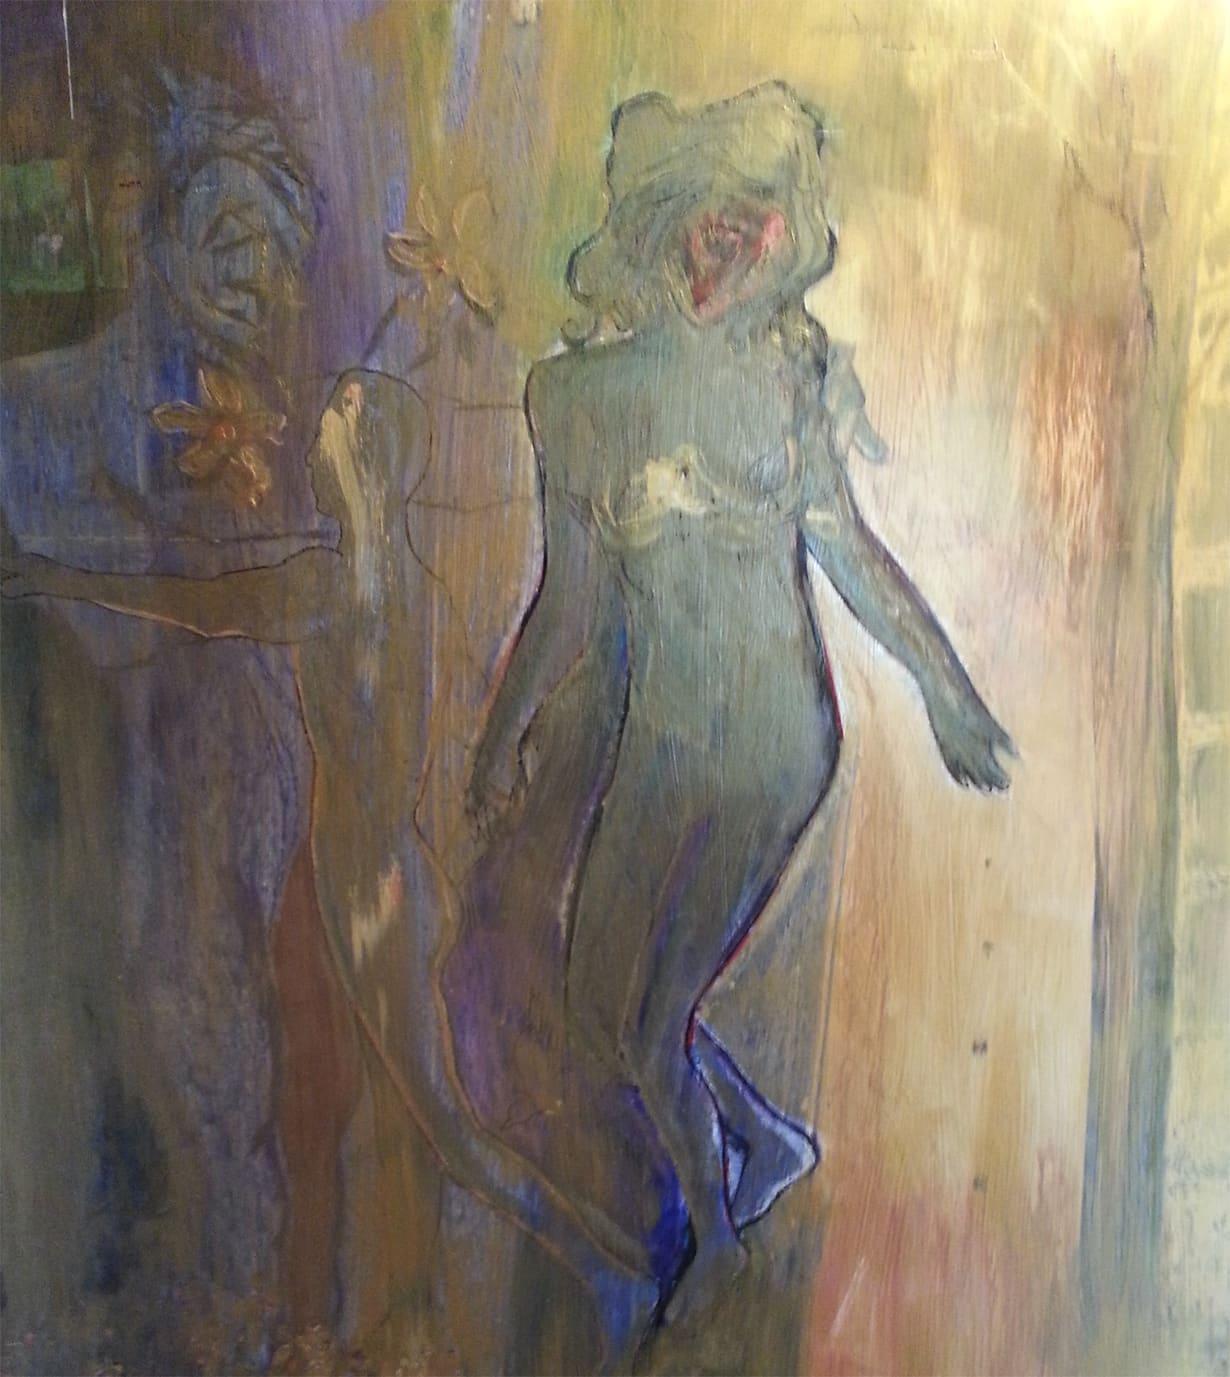 Contemporary Art Oil on Canvas Titled The Seeding Artist Todd Krasovetz 4 x 4 feet Price 5400